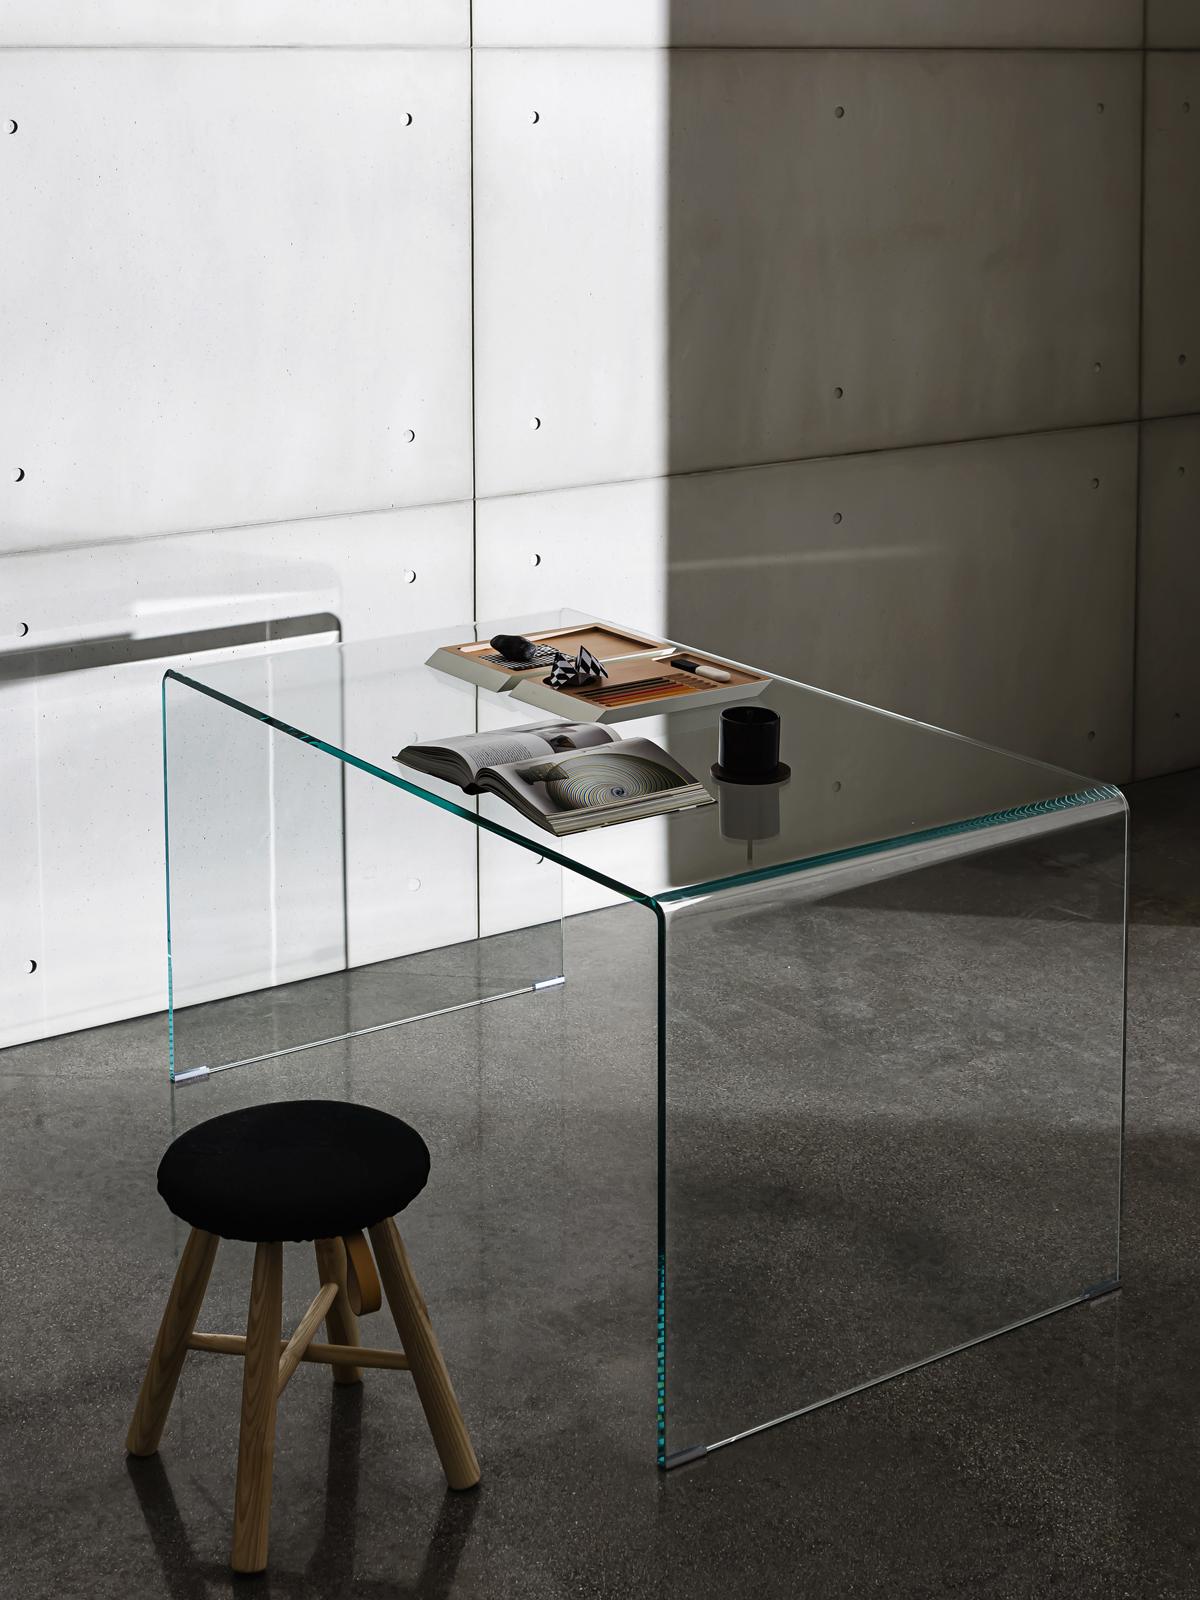 ... glass desk ... XUXKFYV